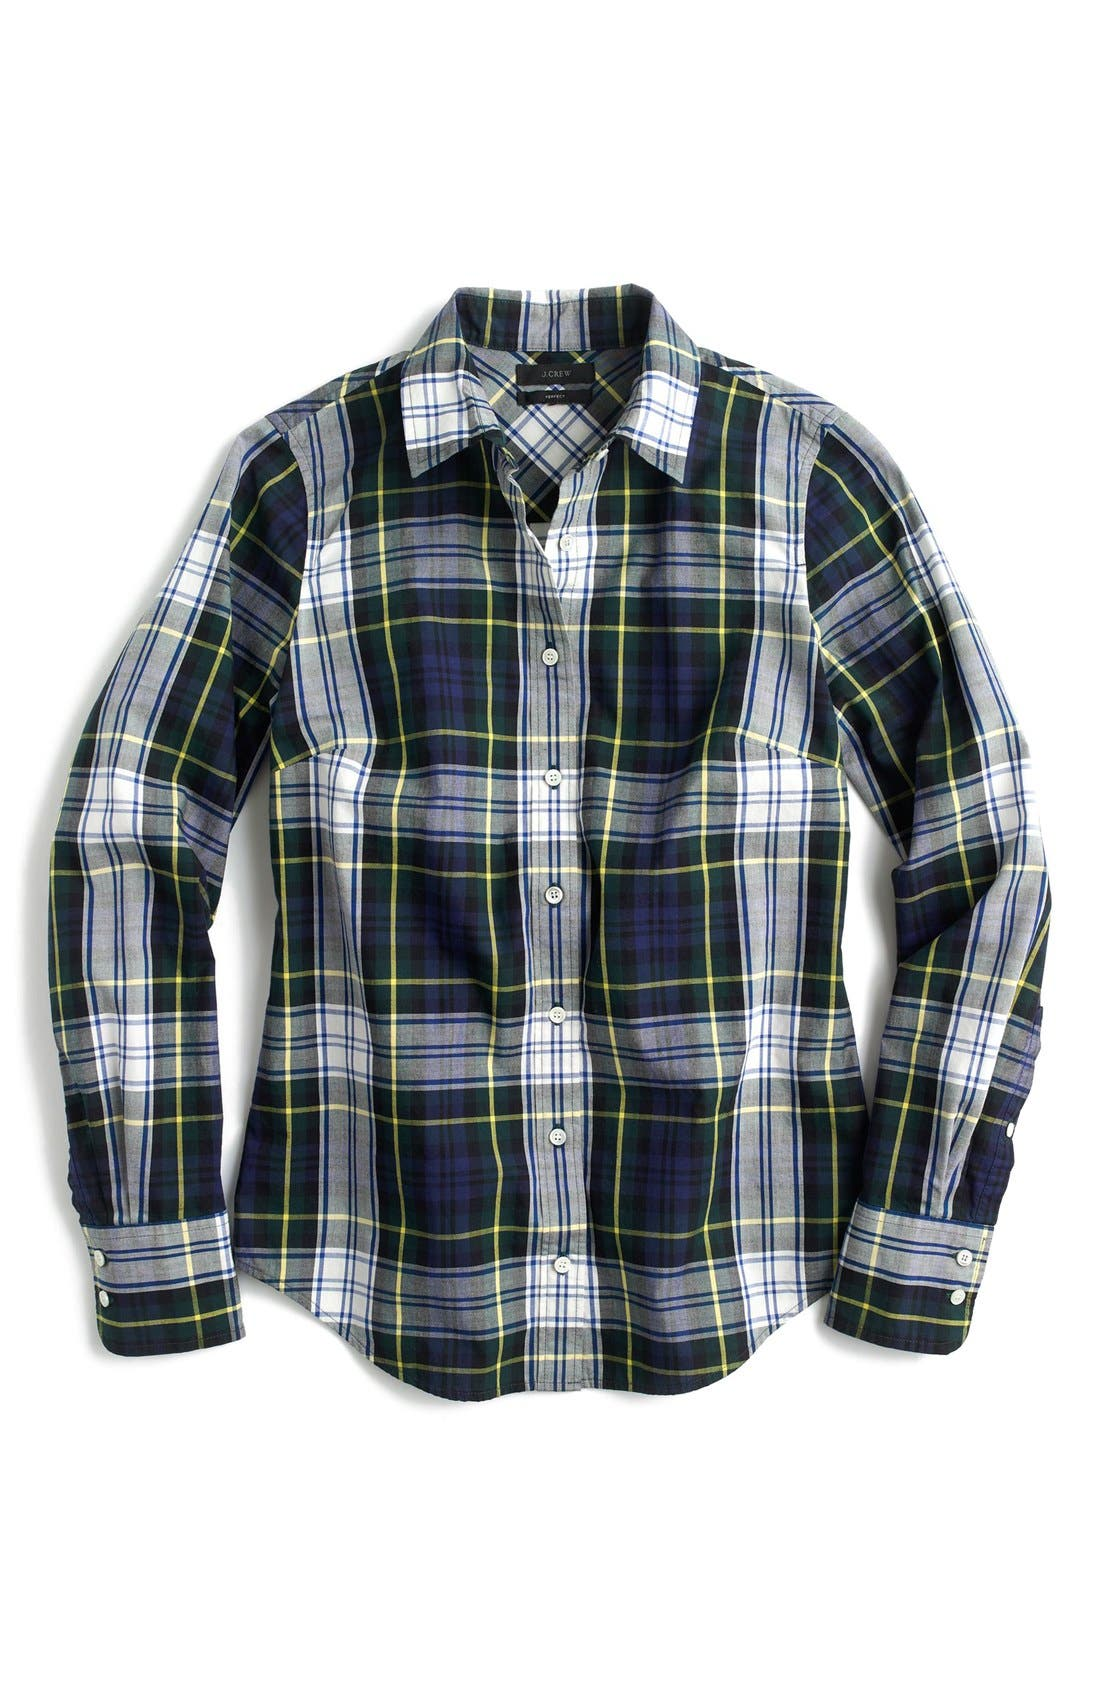 Alternate Image 3  - J.Crew Navy Stewart Plaid Perfect Shirt (Regular & Petite)